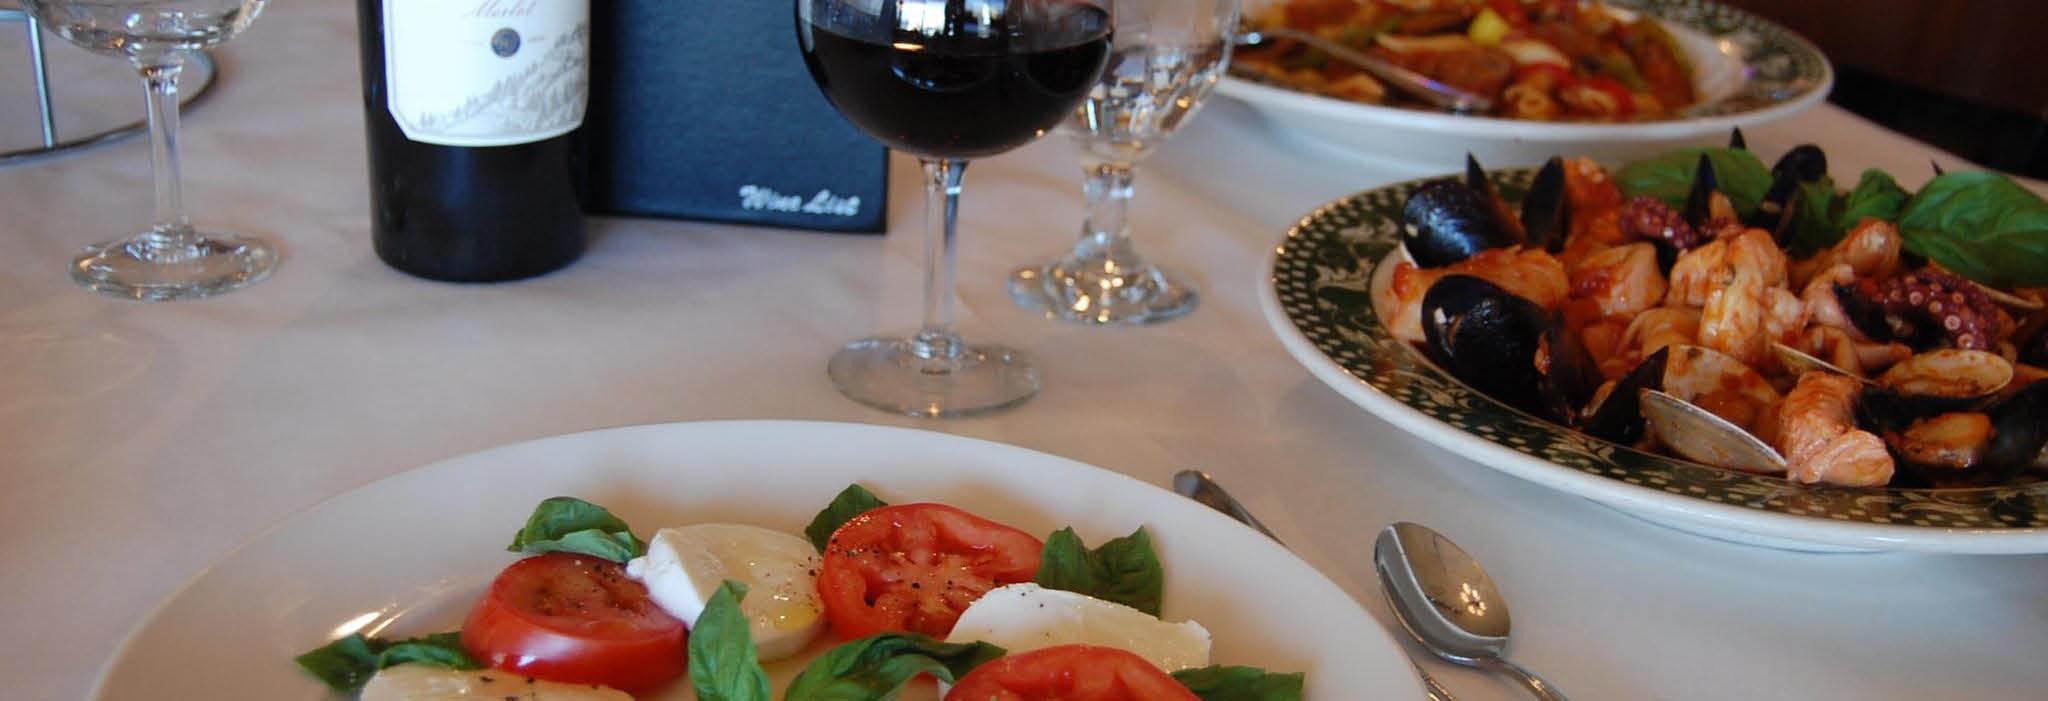 RoccoVino's Italian Restaurant in Orland Park, IL banner